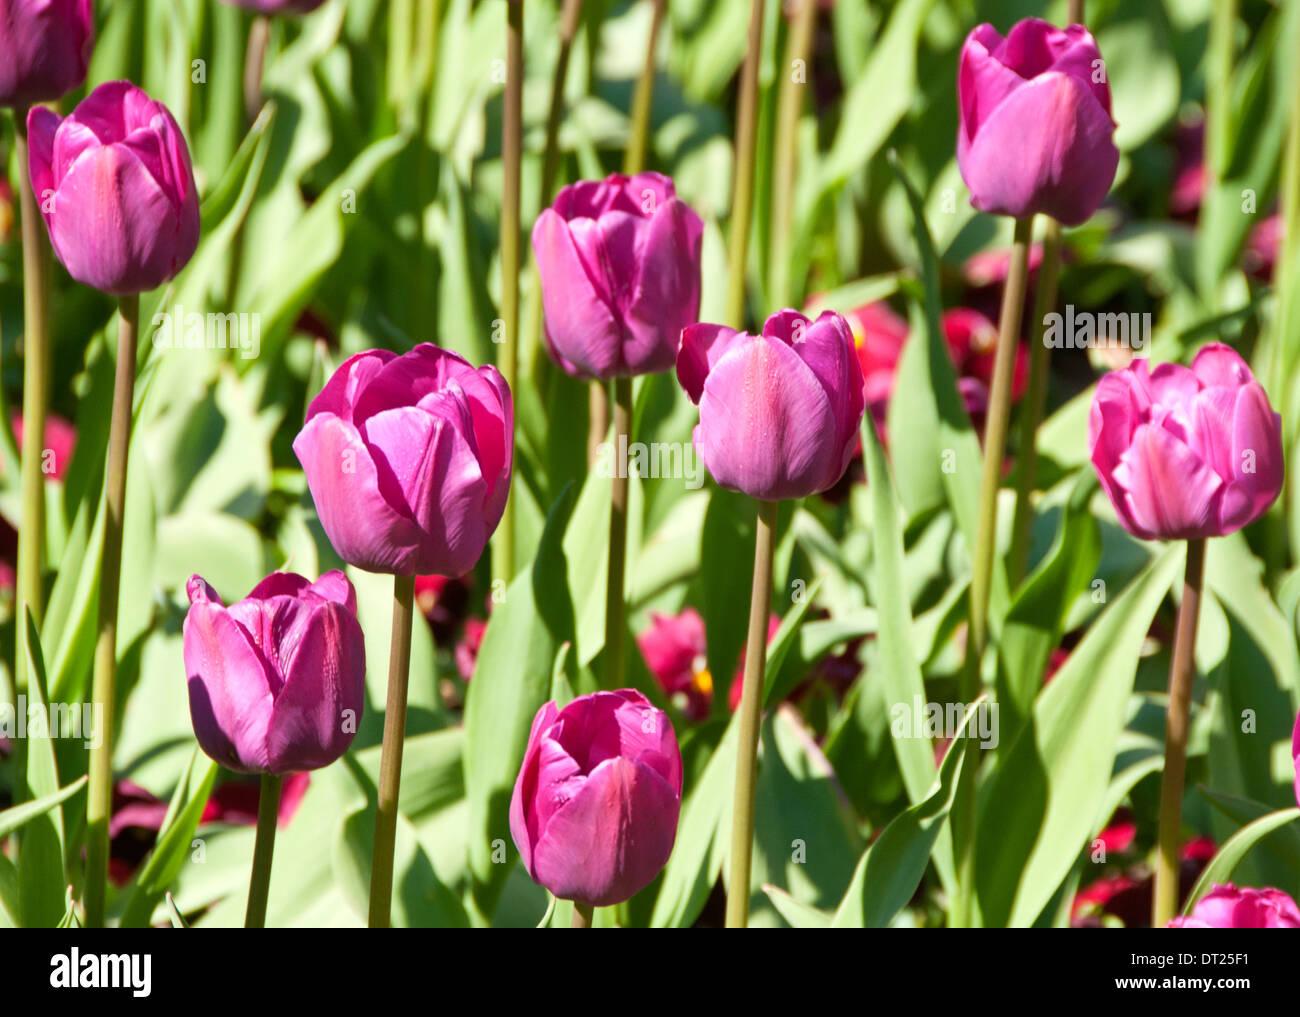 Purple Tulips (Botanical Name: Tulipa) - Stock Image